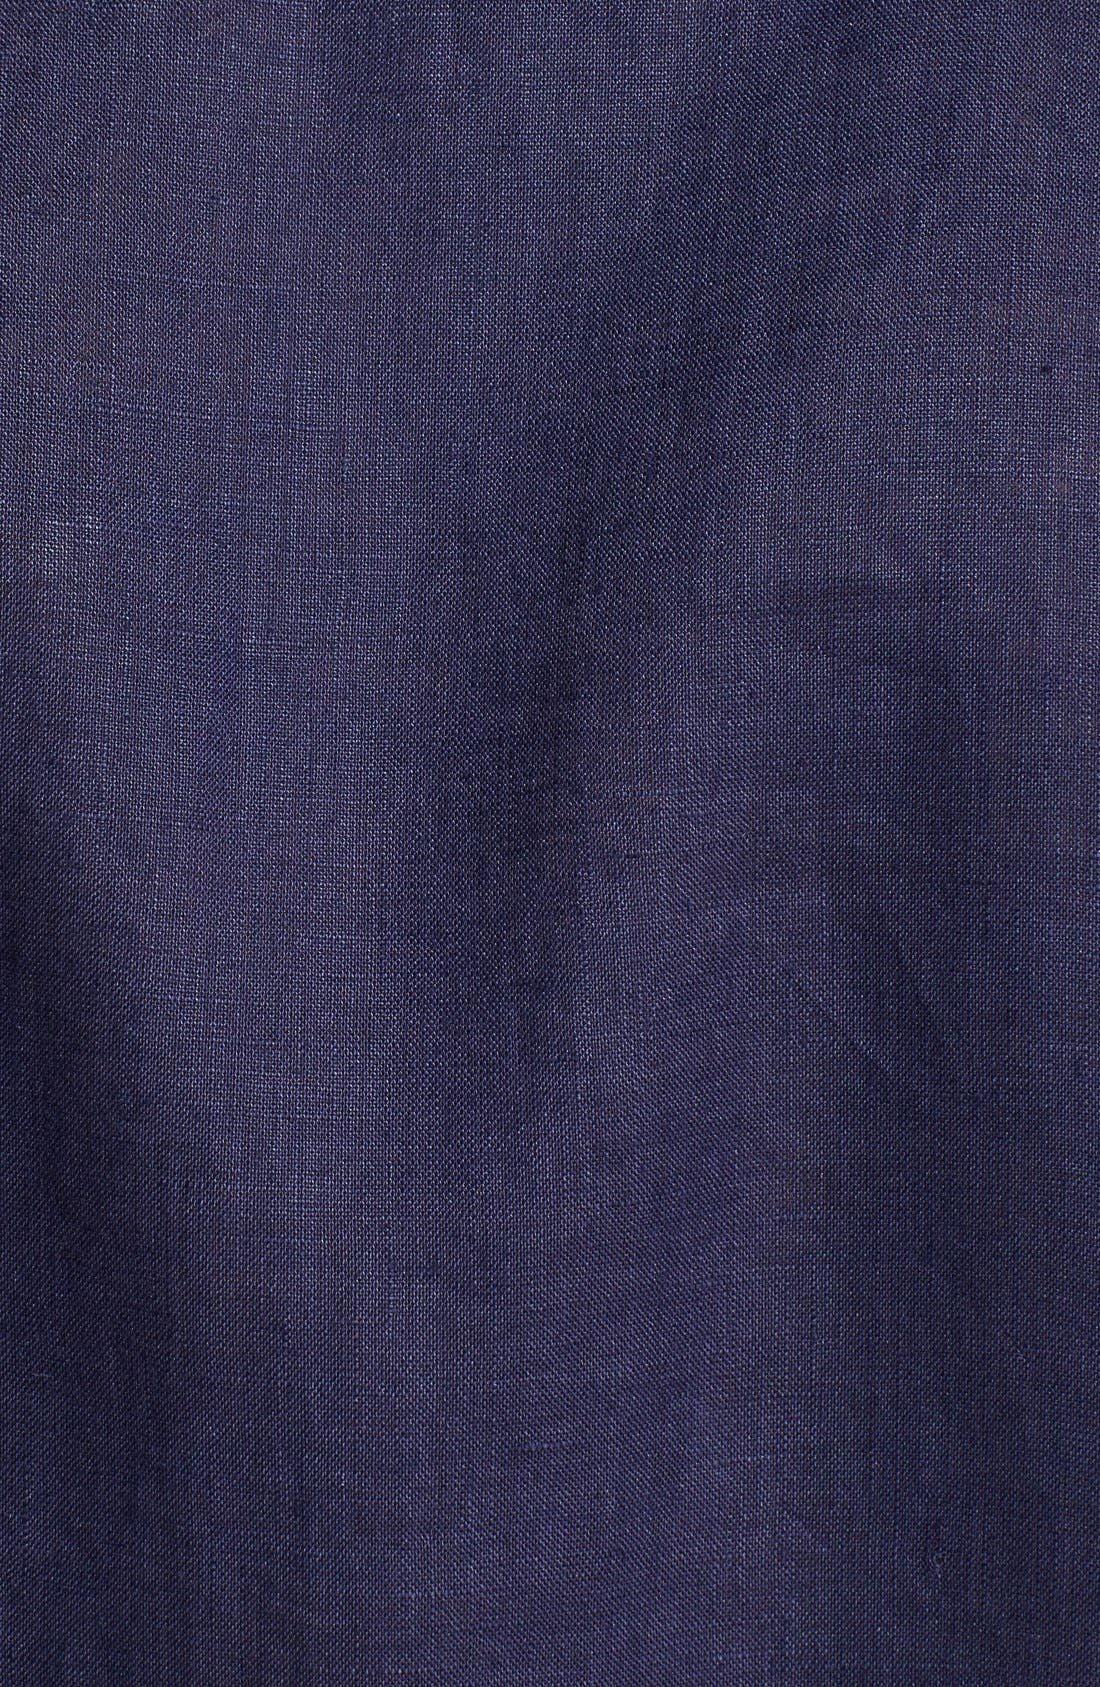 'Caroubier' Linen Shirt,                             Alternate thumbnail 24, color,